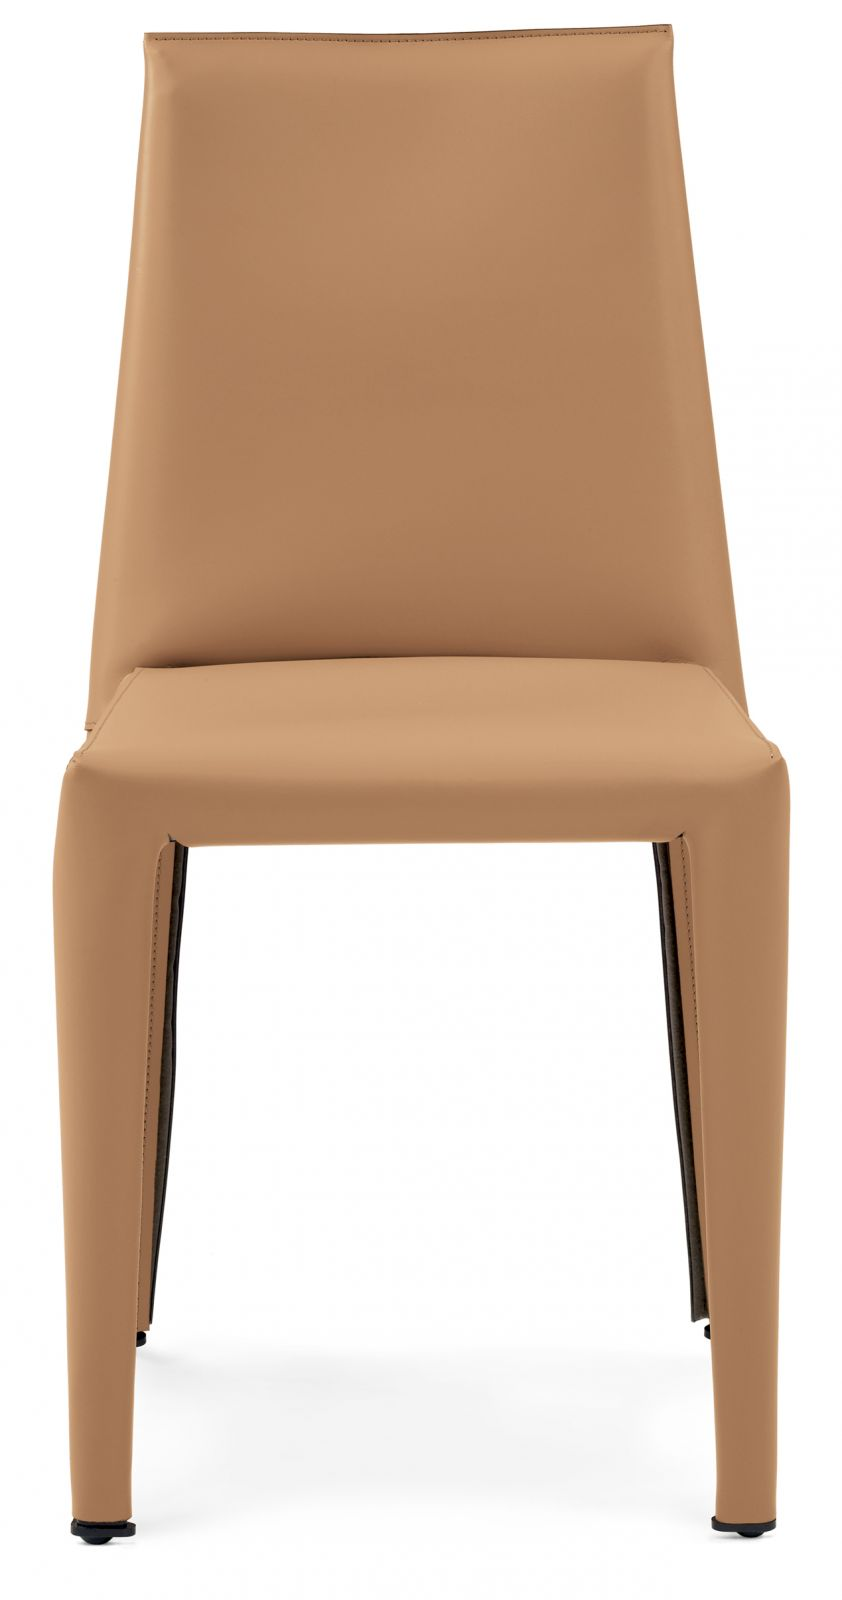 modern-office-furniture-chairs-Italian-designer-furniture (18).jpg